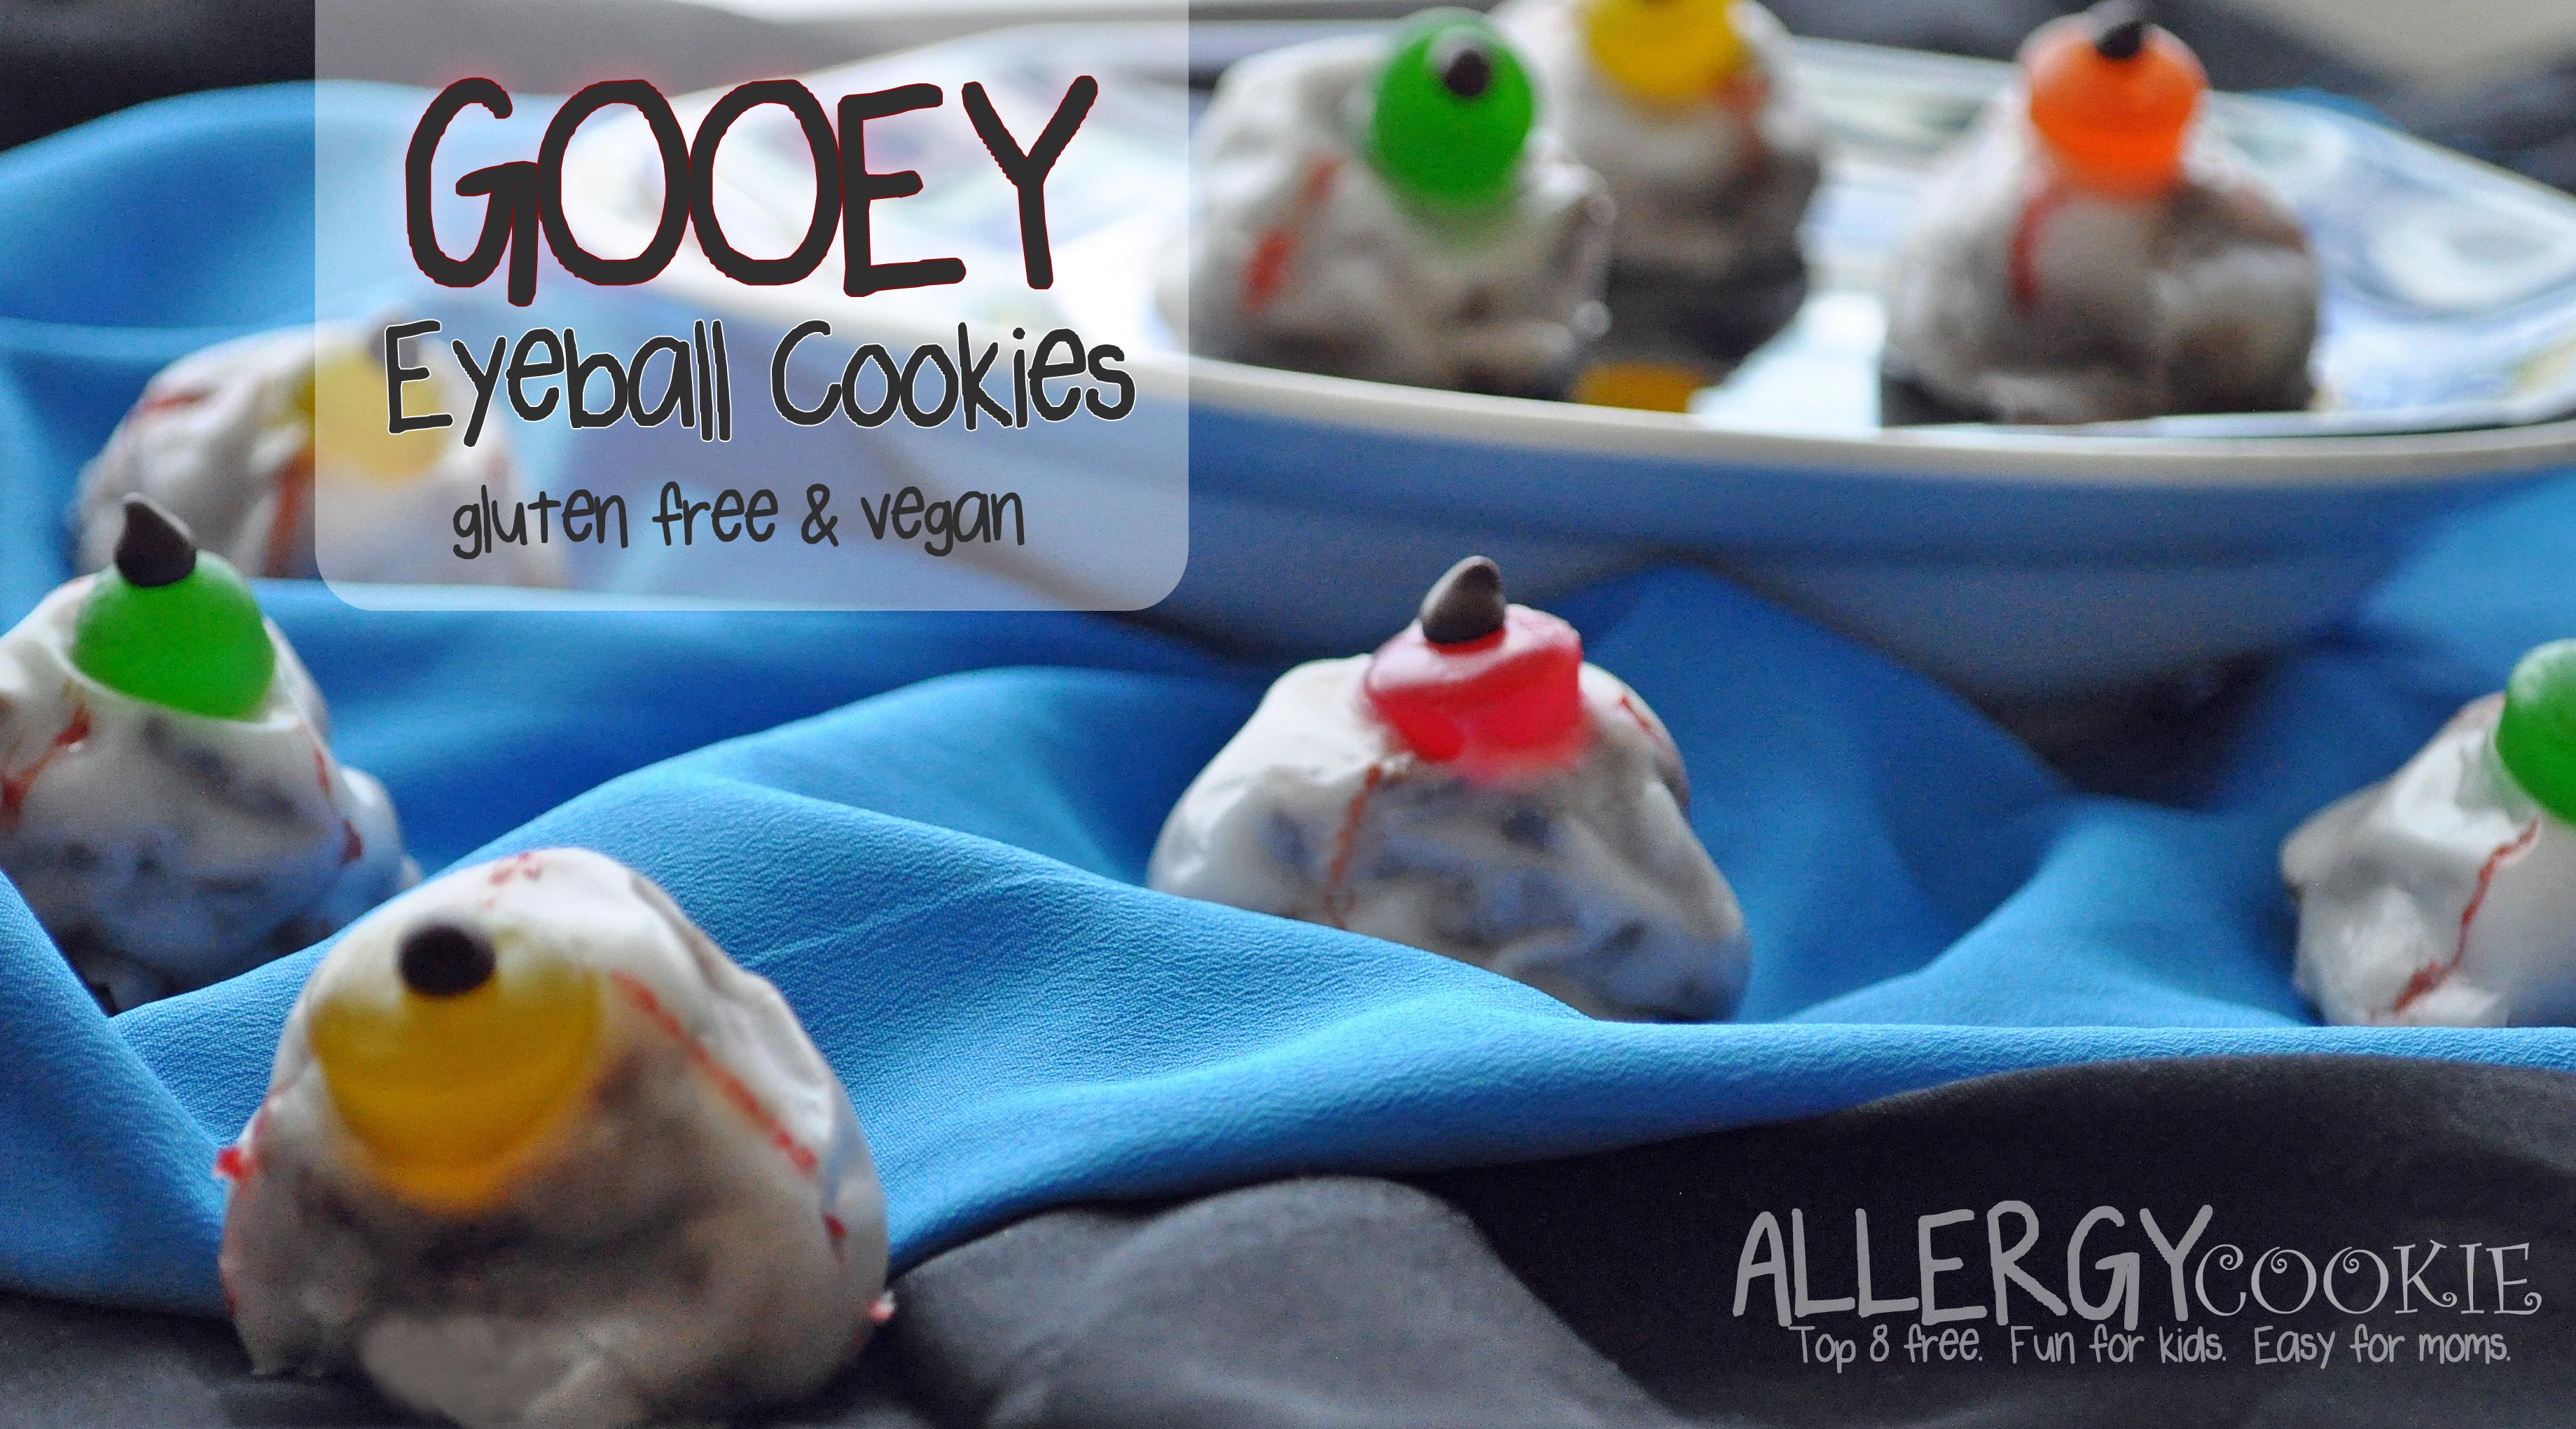 Gooey Eyeball Cookies (gluten free, vegan, top 8 free*)